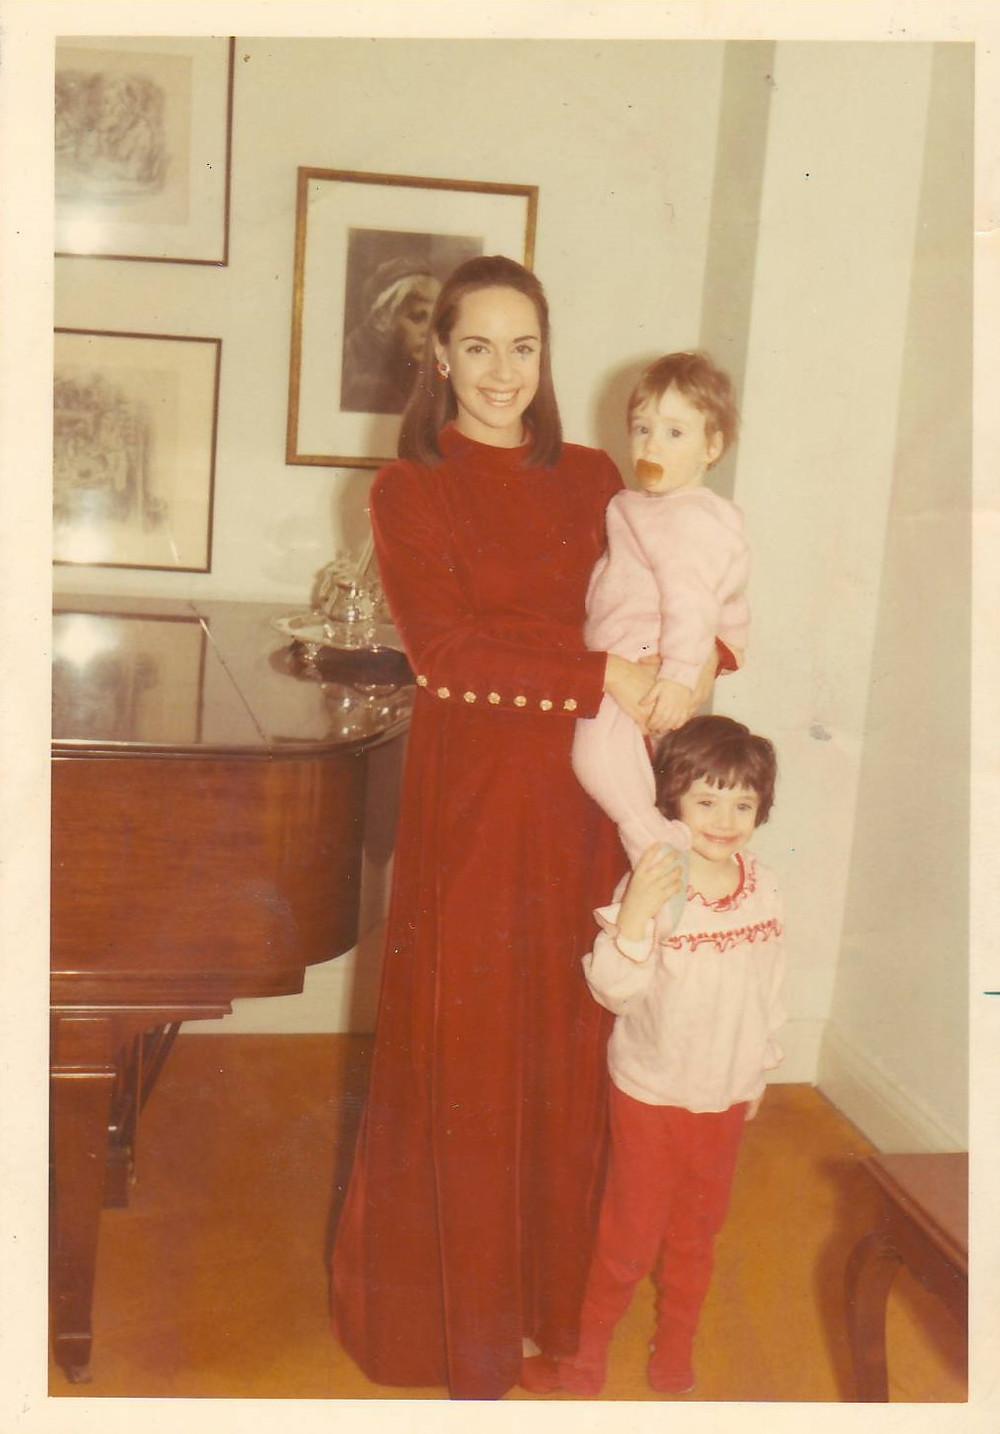 Mom, me and Ellice, vintage Harold Levine Dress, Amy Stein-Milford